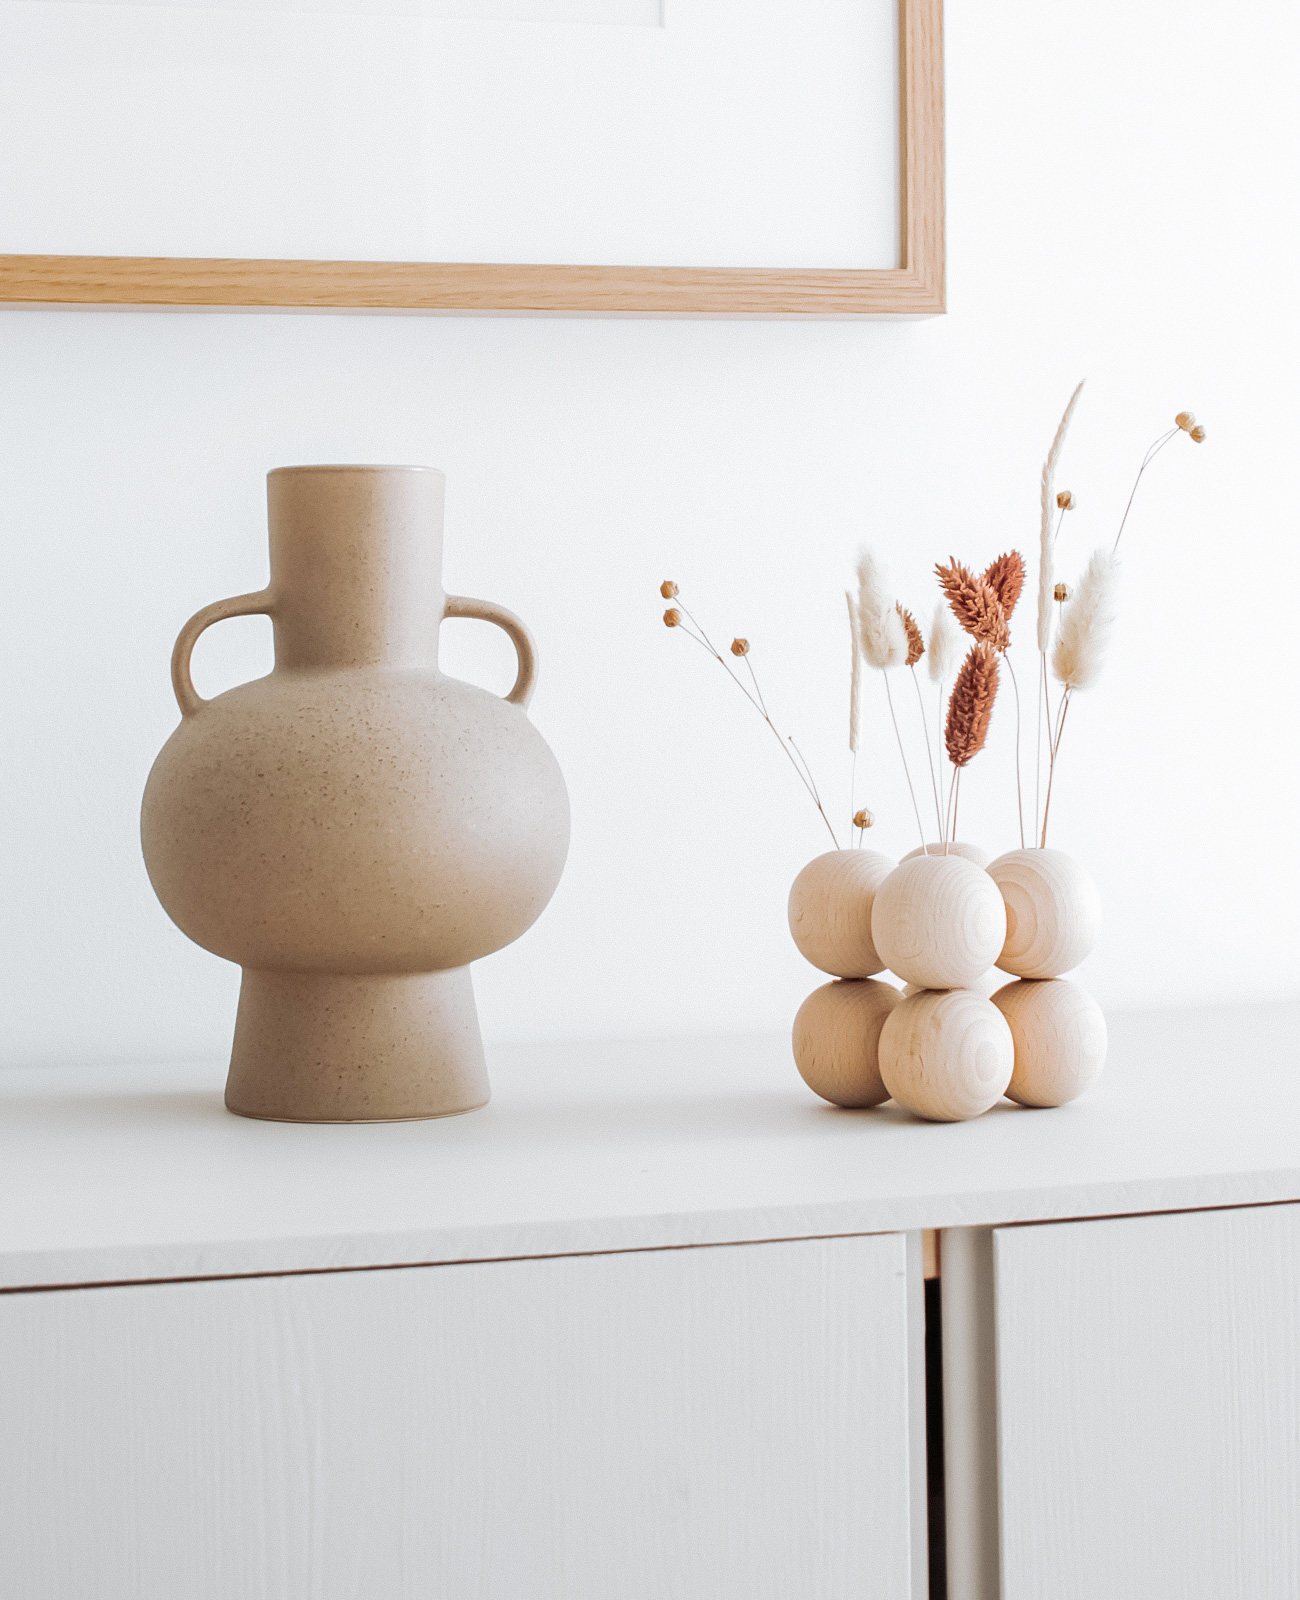 vase perle bois fleurs sechees tuto deco diy